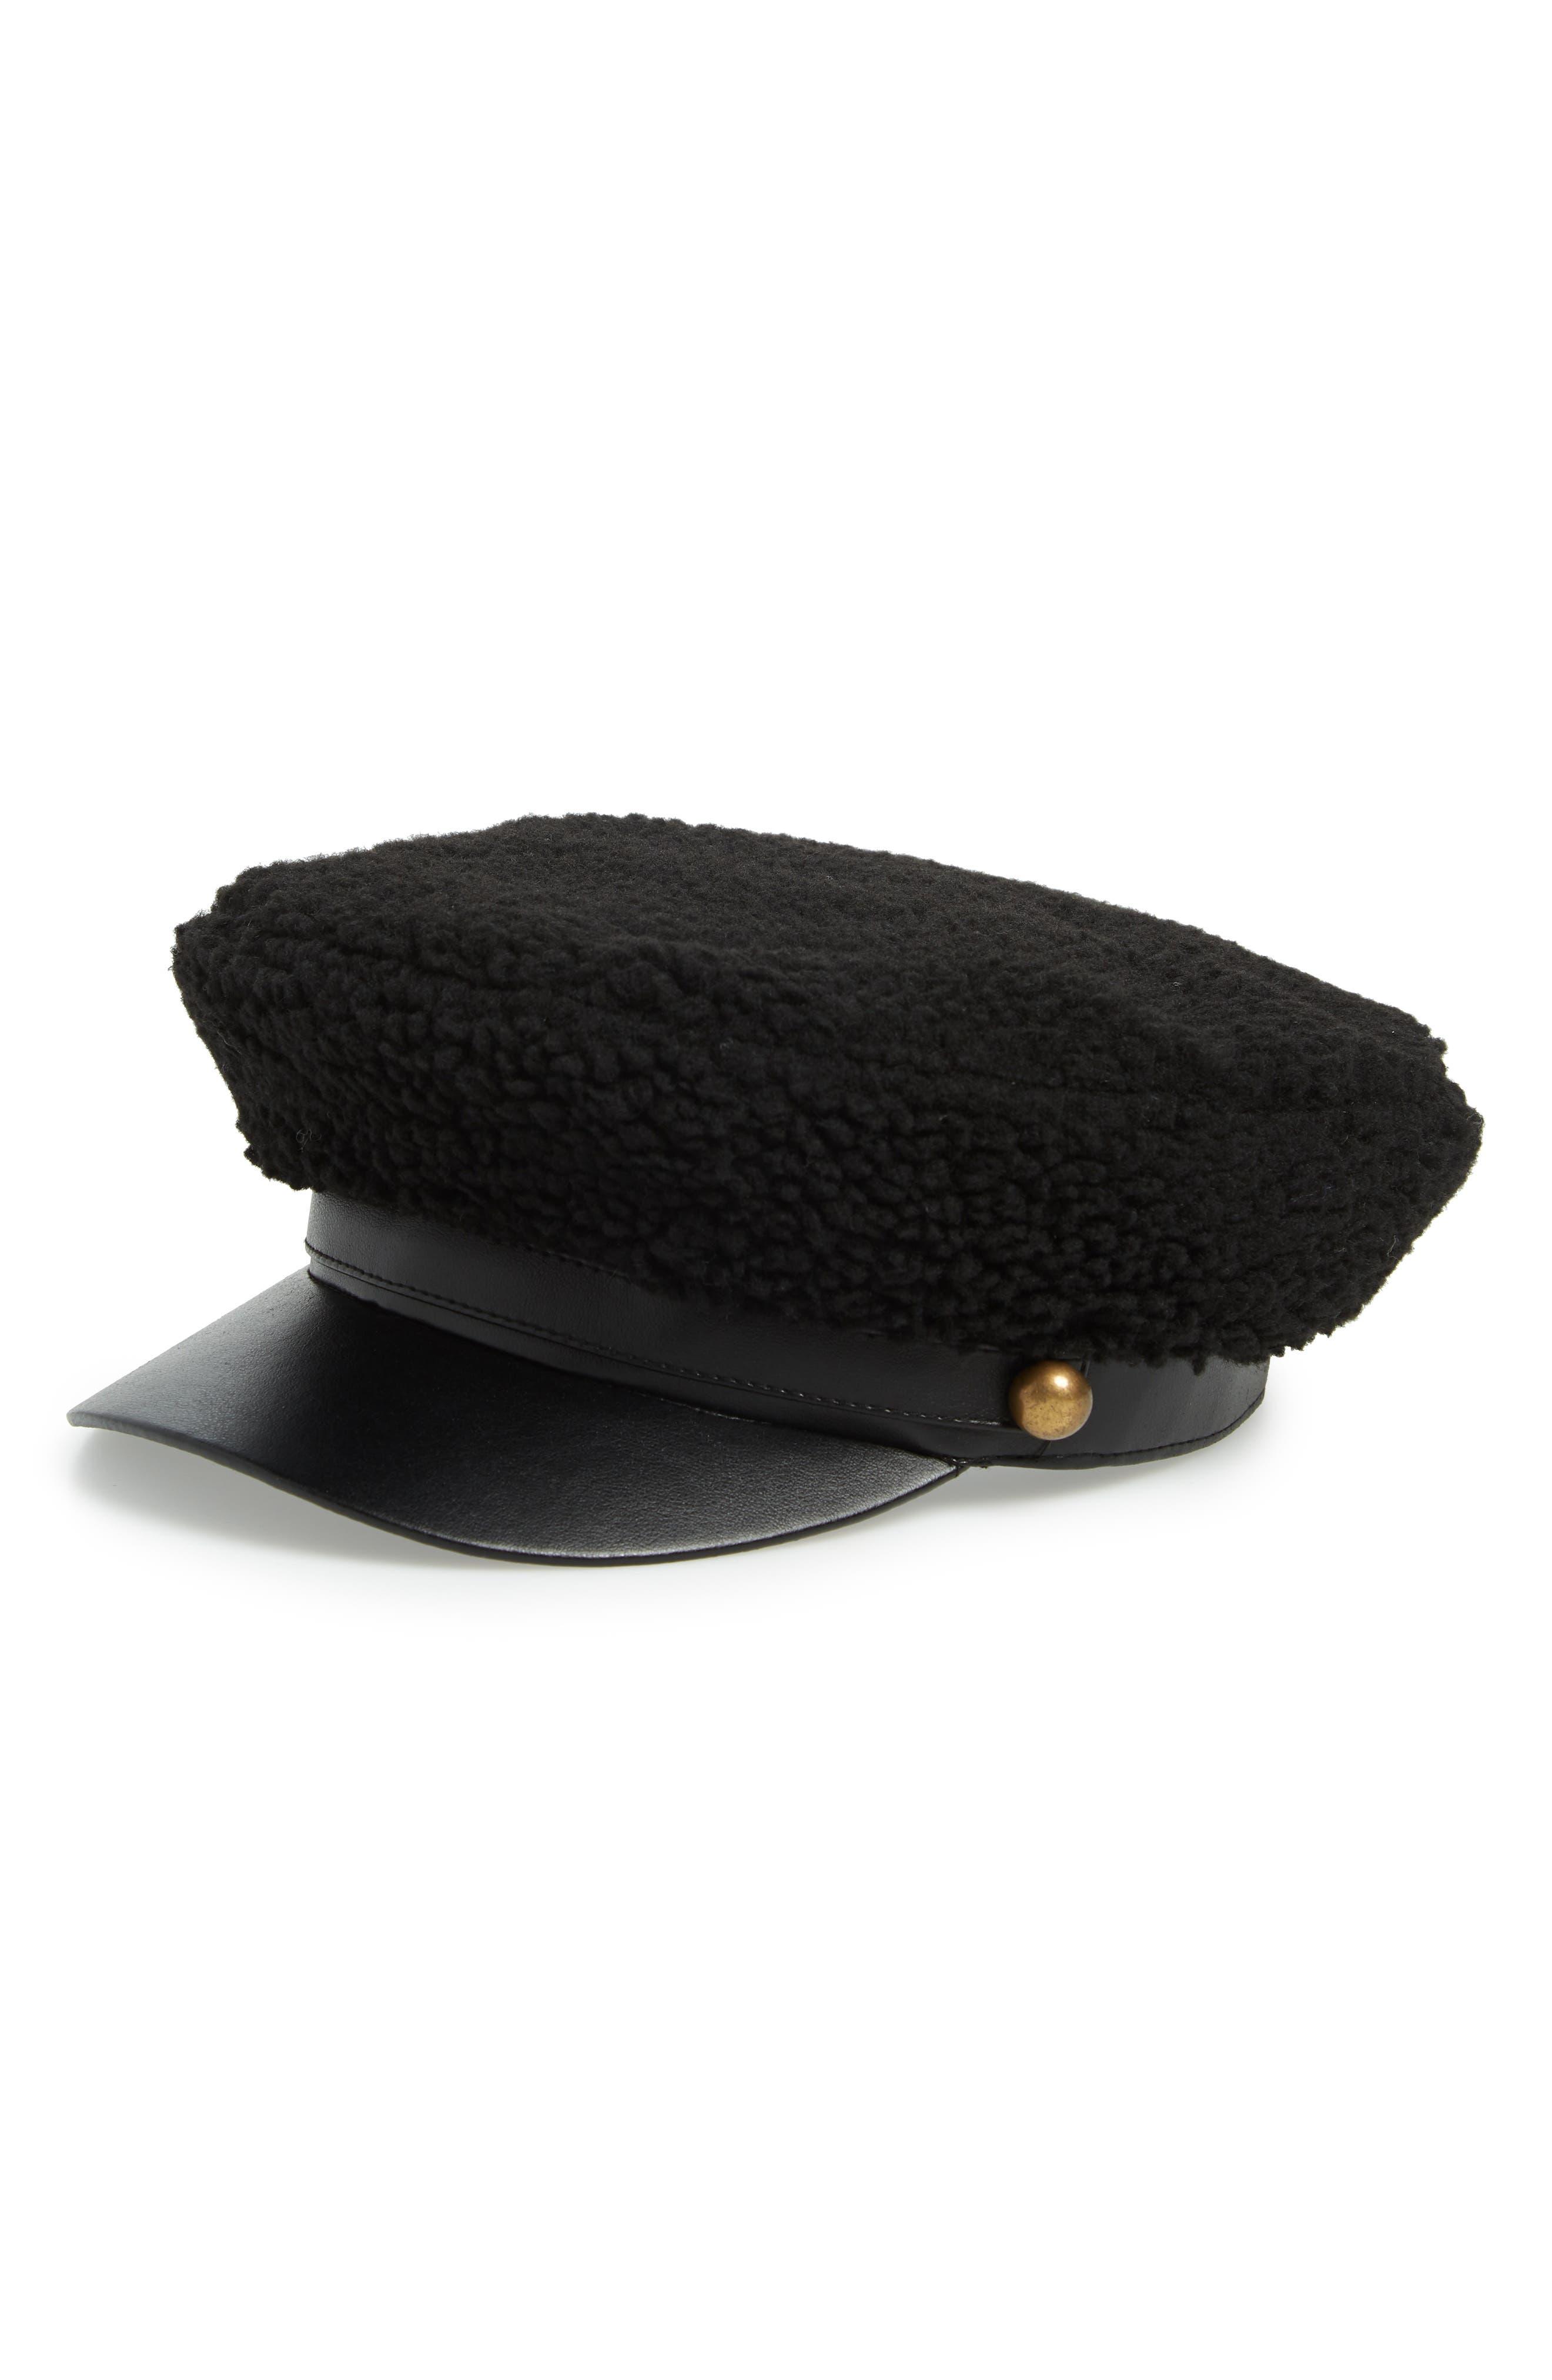 Fleece Cabbie Cap,                             Main thumbnail 1, color,                             BLACK COMBO